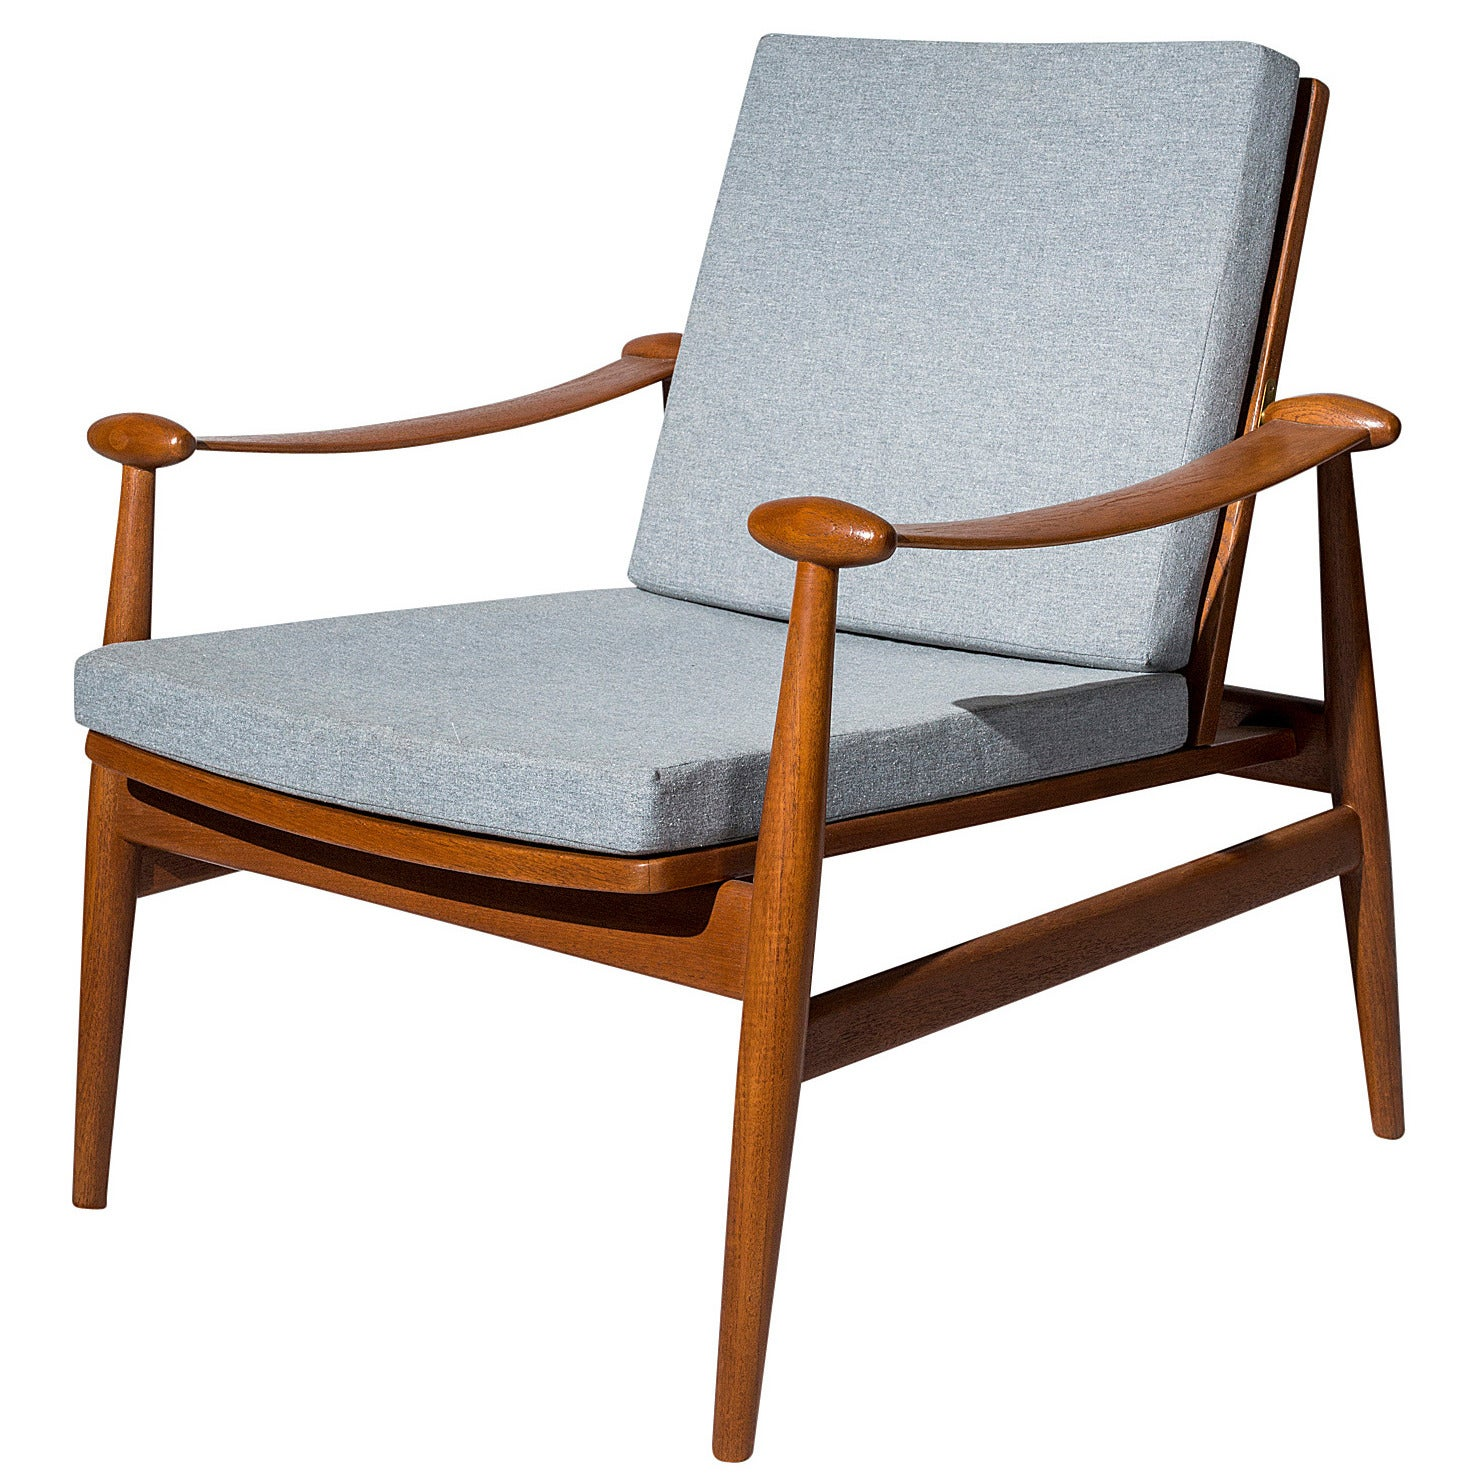 "Finn Juhl ""Spade"" Lounge Chair"